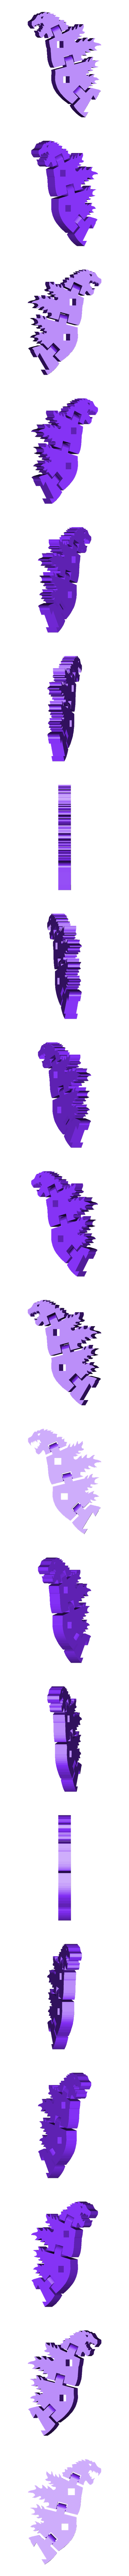 8a_Godzilla_Body_split_A_v2.stl Download free STL file Flexi Godzilla • 3D printable object, dancingchicken